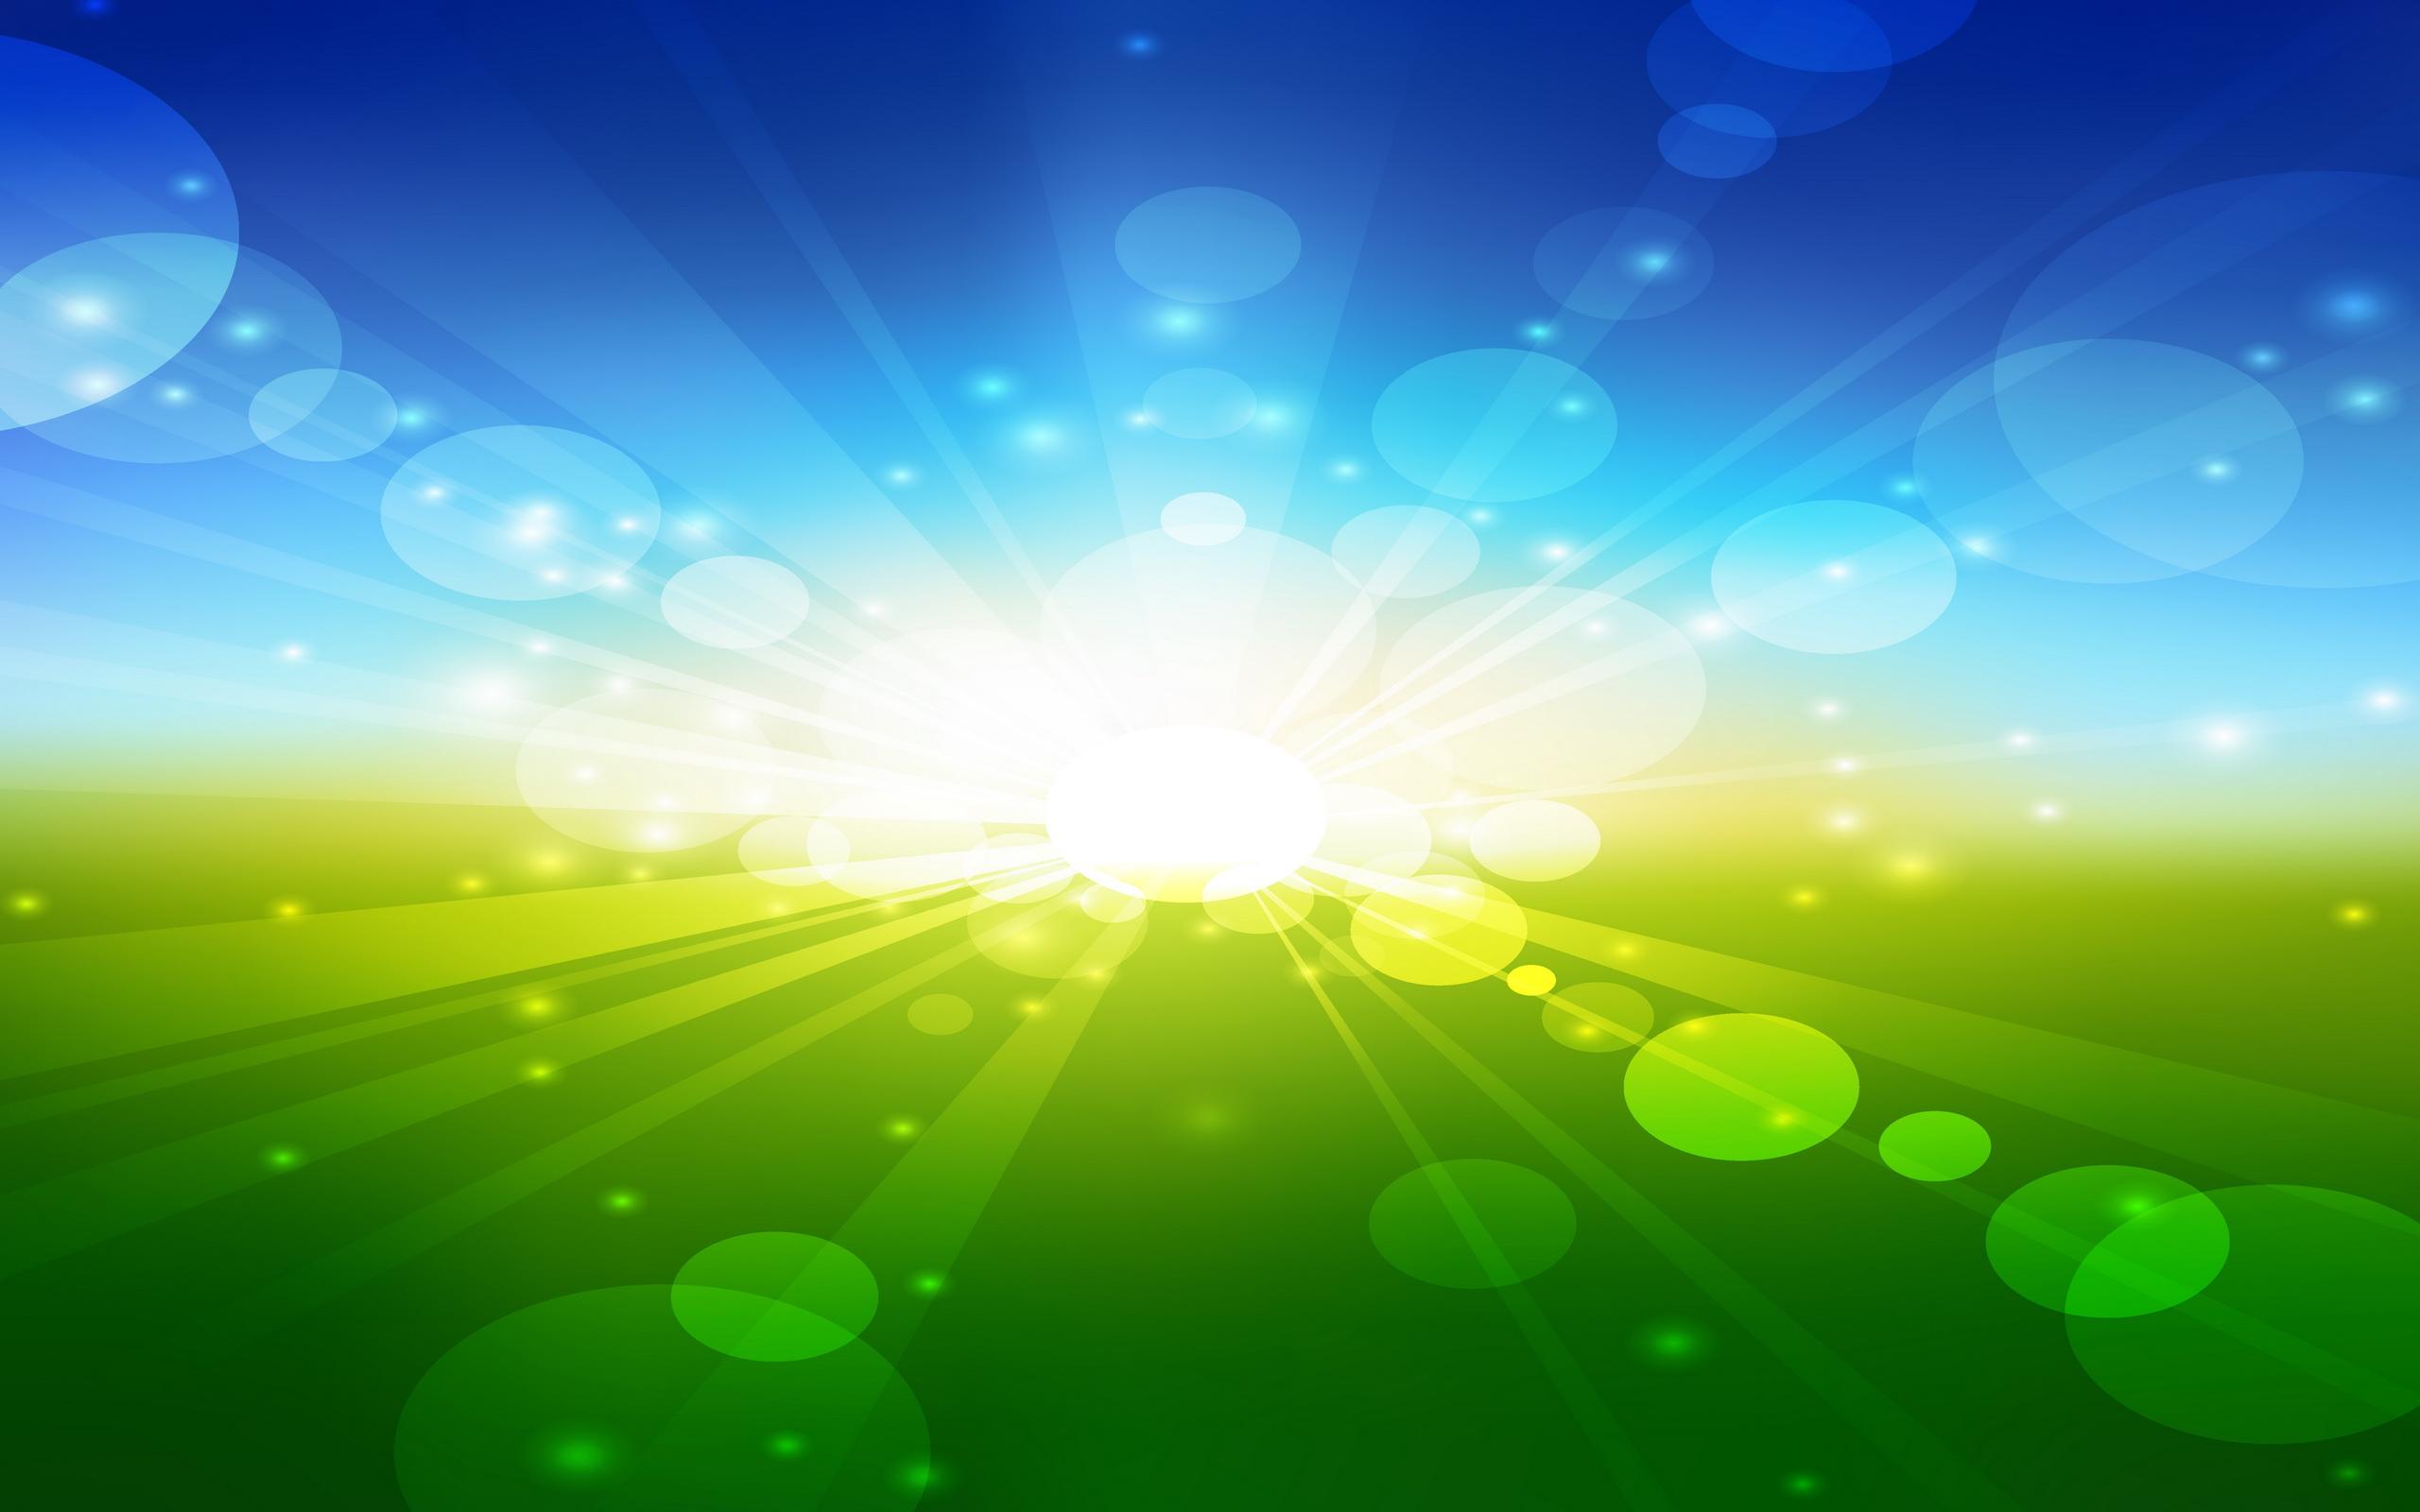 Vector Background Free Download wallpaper - 1099318